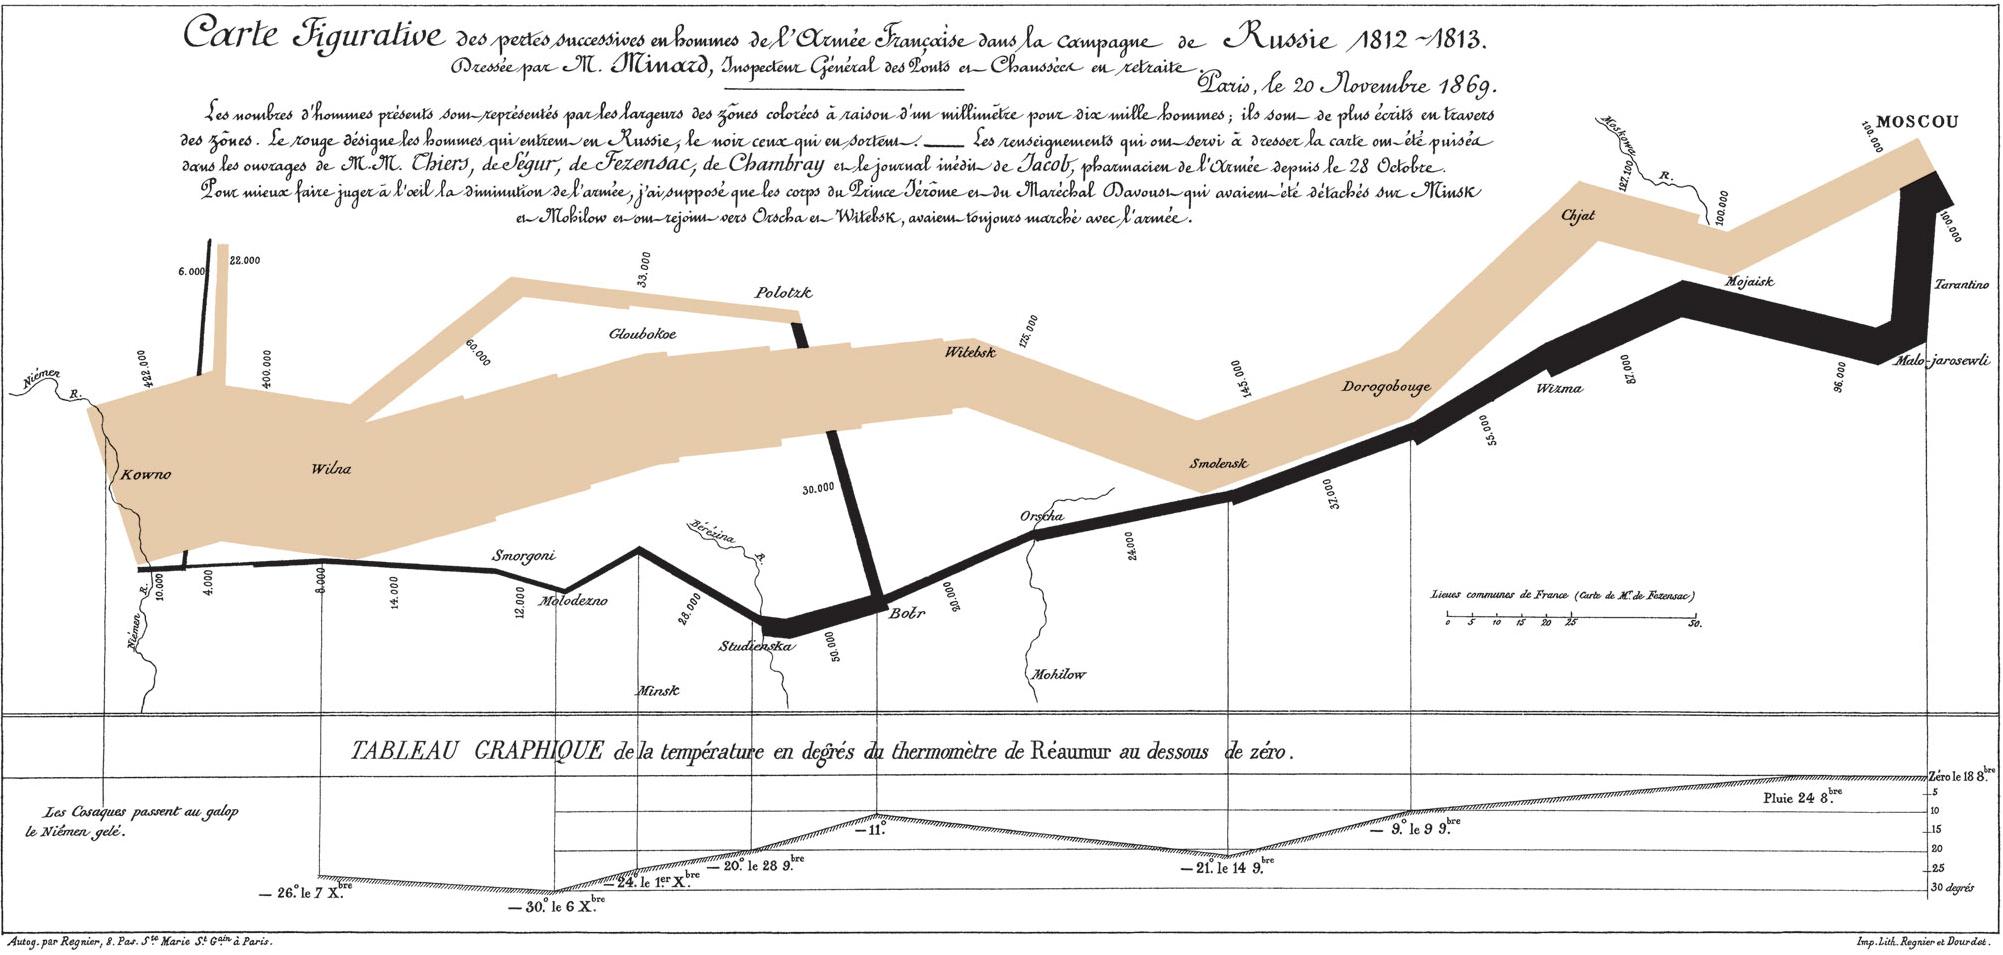 Minard's march – a hallmark visualization, rightly so?